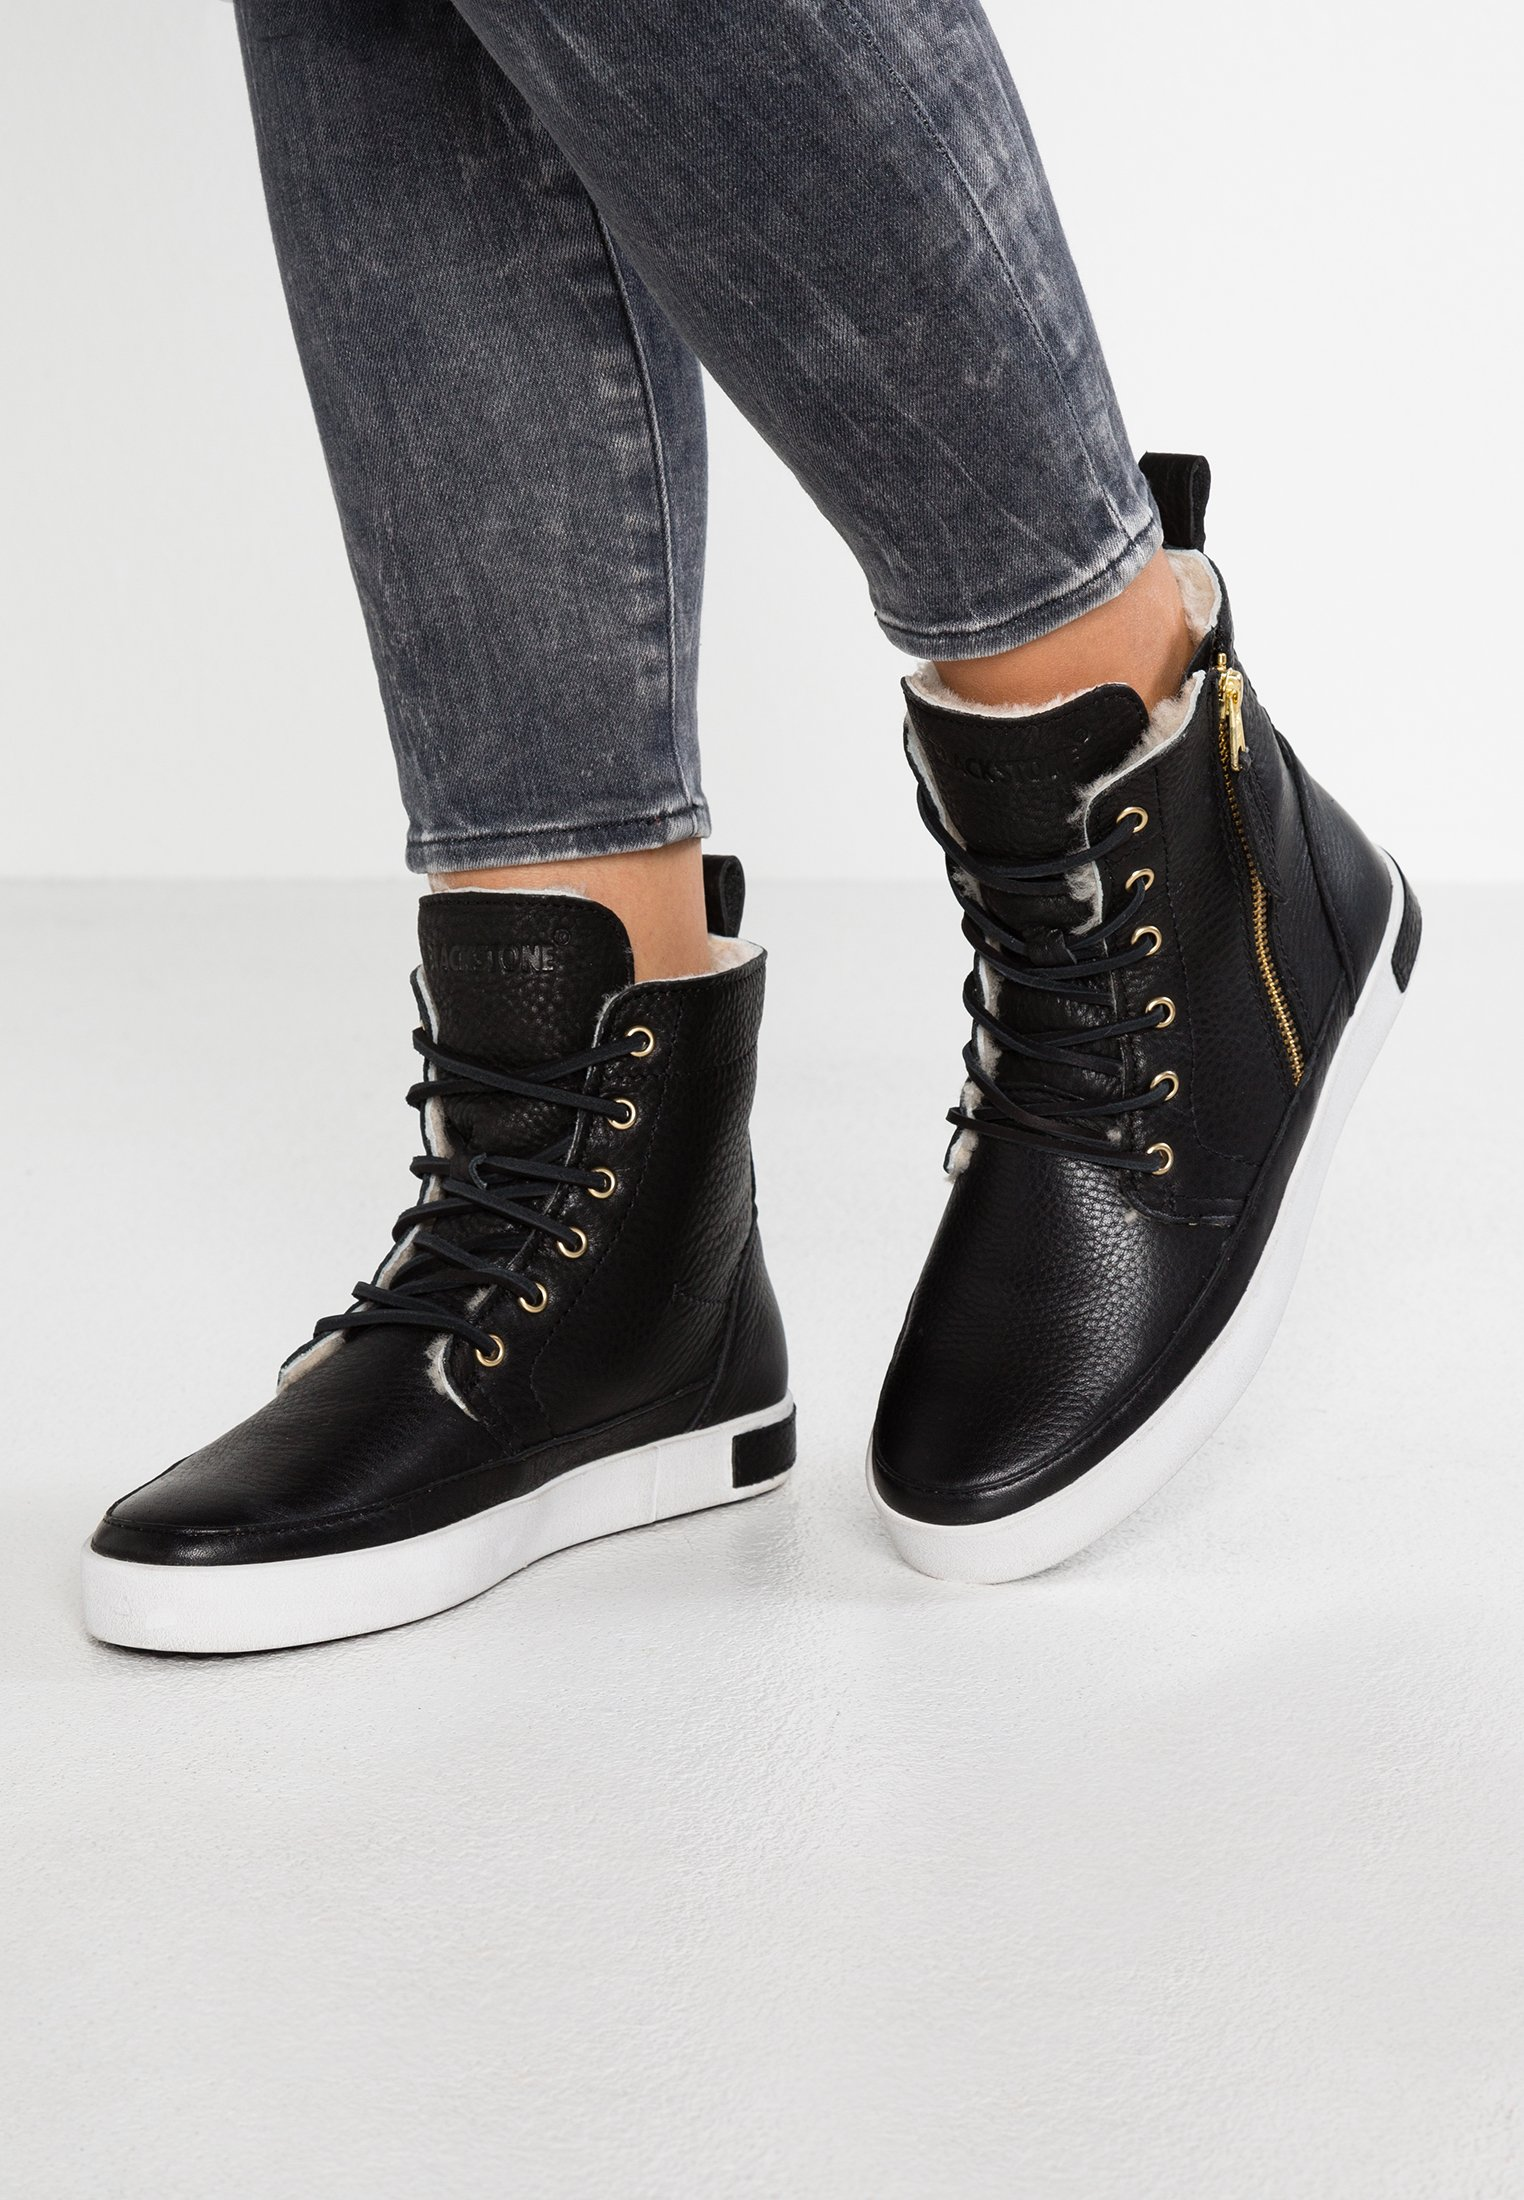 Blackstone LAOS TOWN - Sneakers alte black